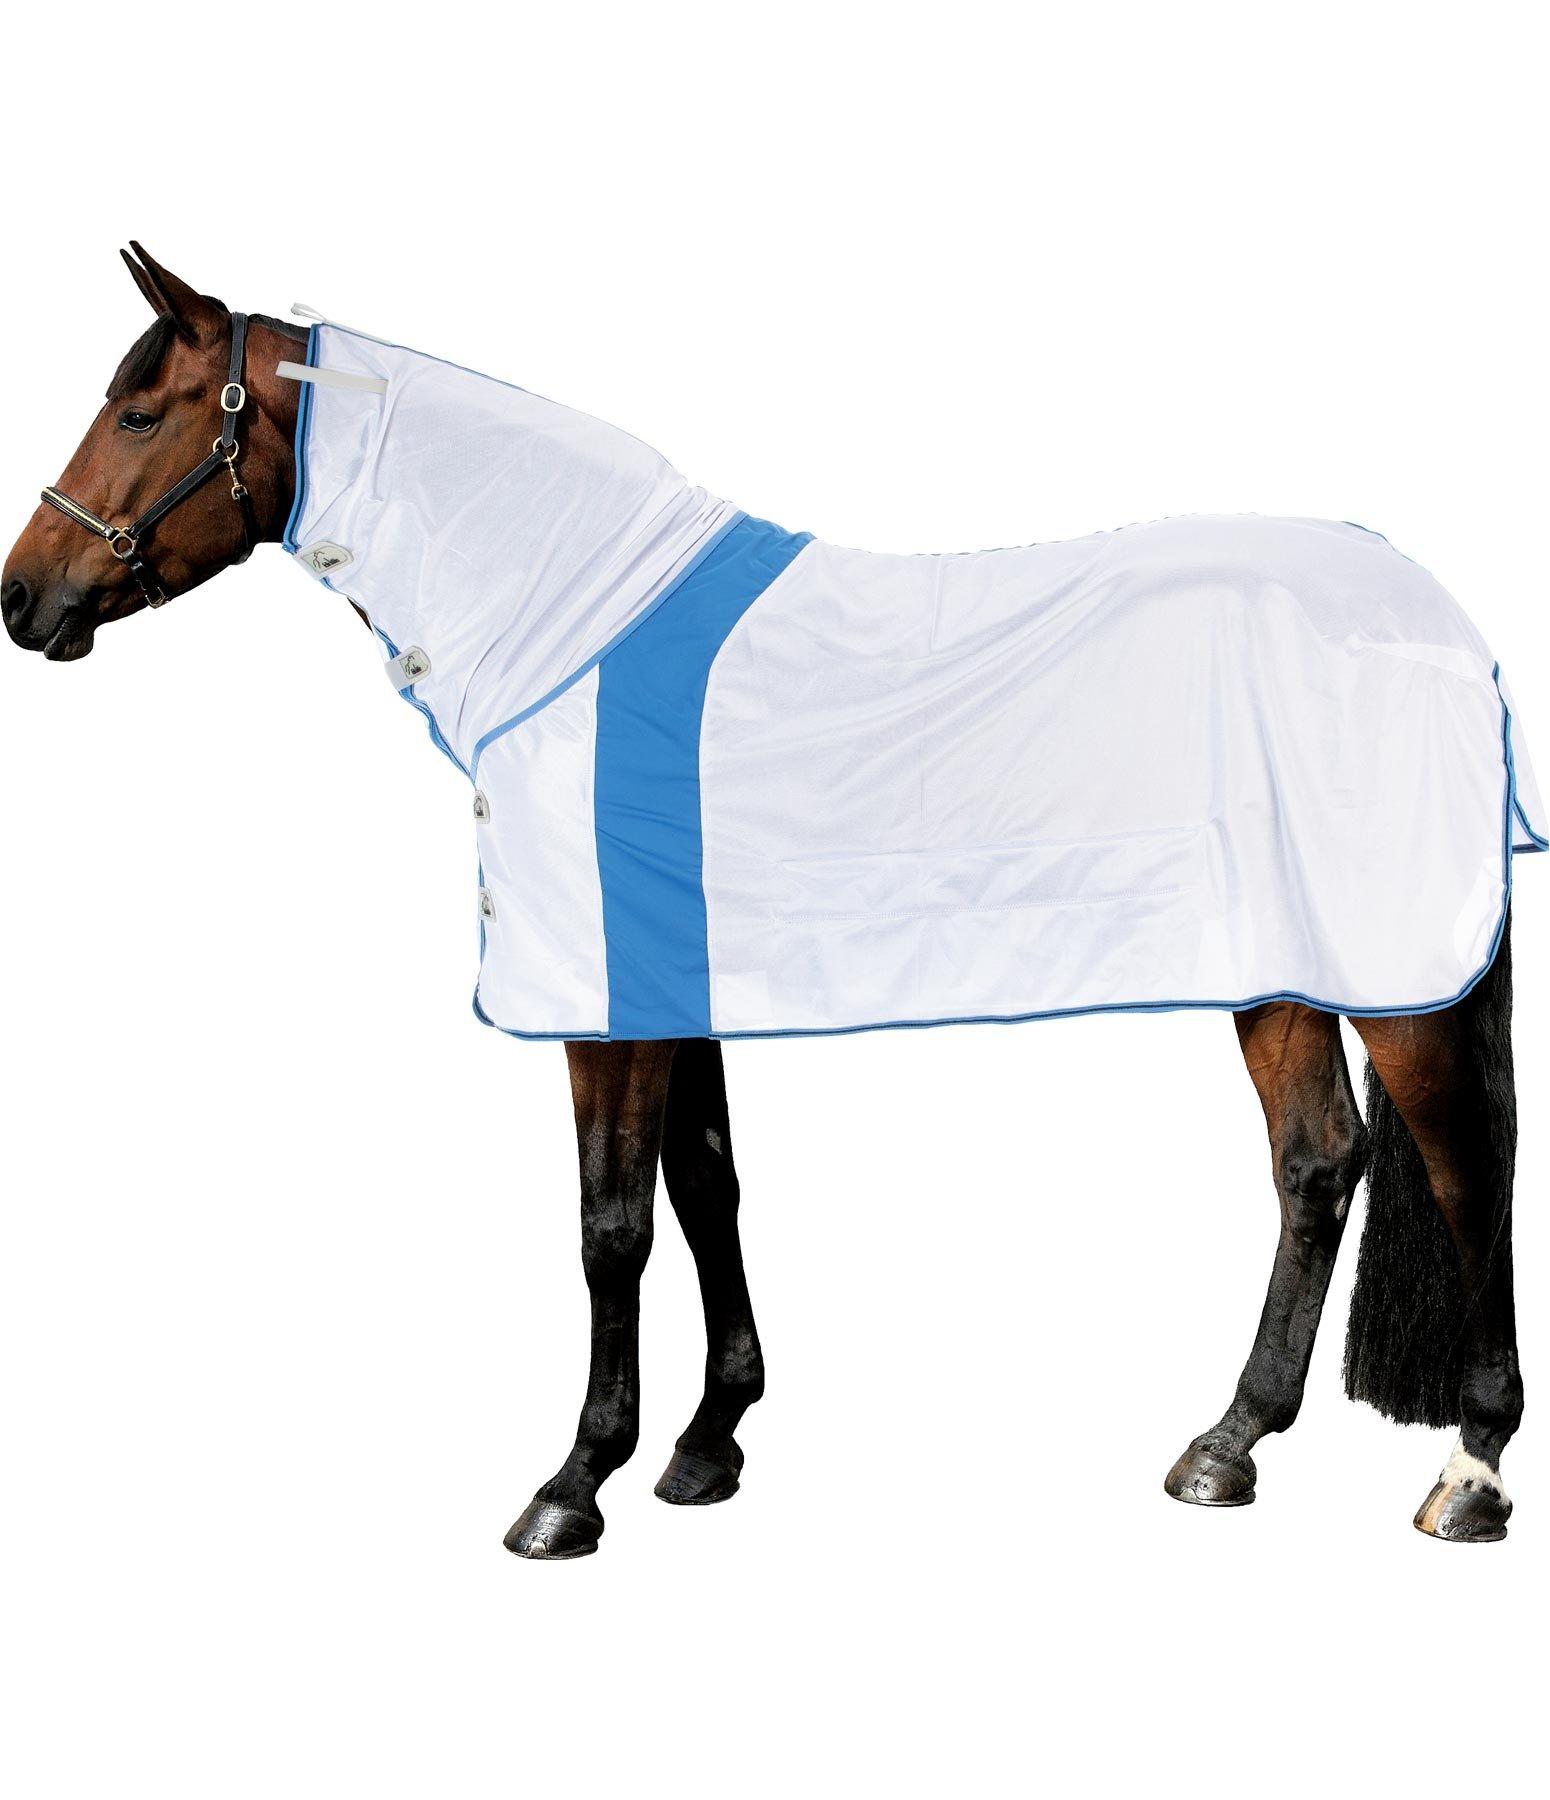 chemise anti mouches avec rabat ventral zip anti mouches. Black Bedroom Furniture Sets. Home Design Ideas